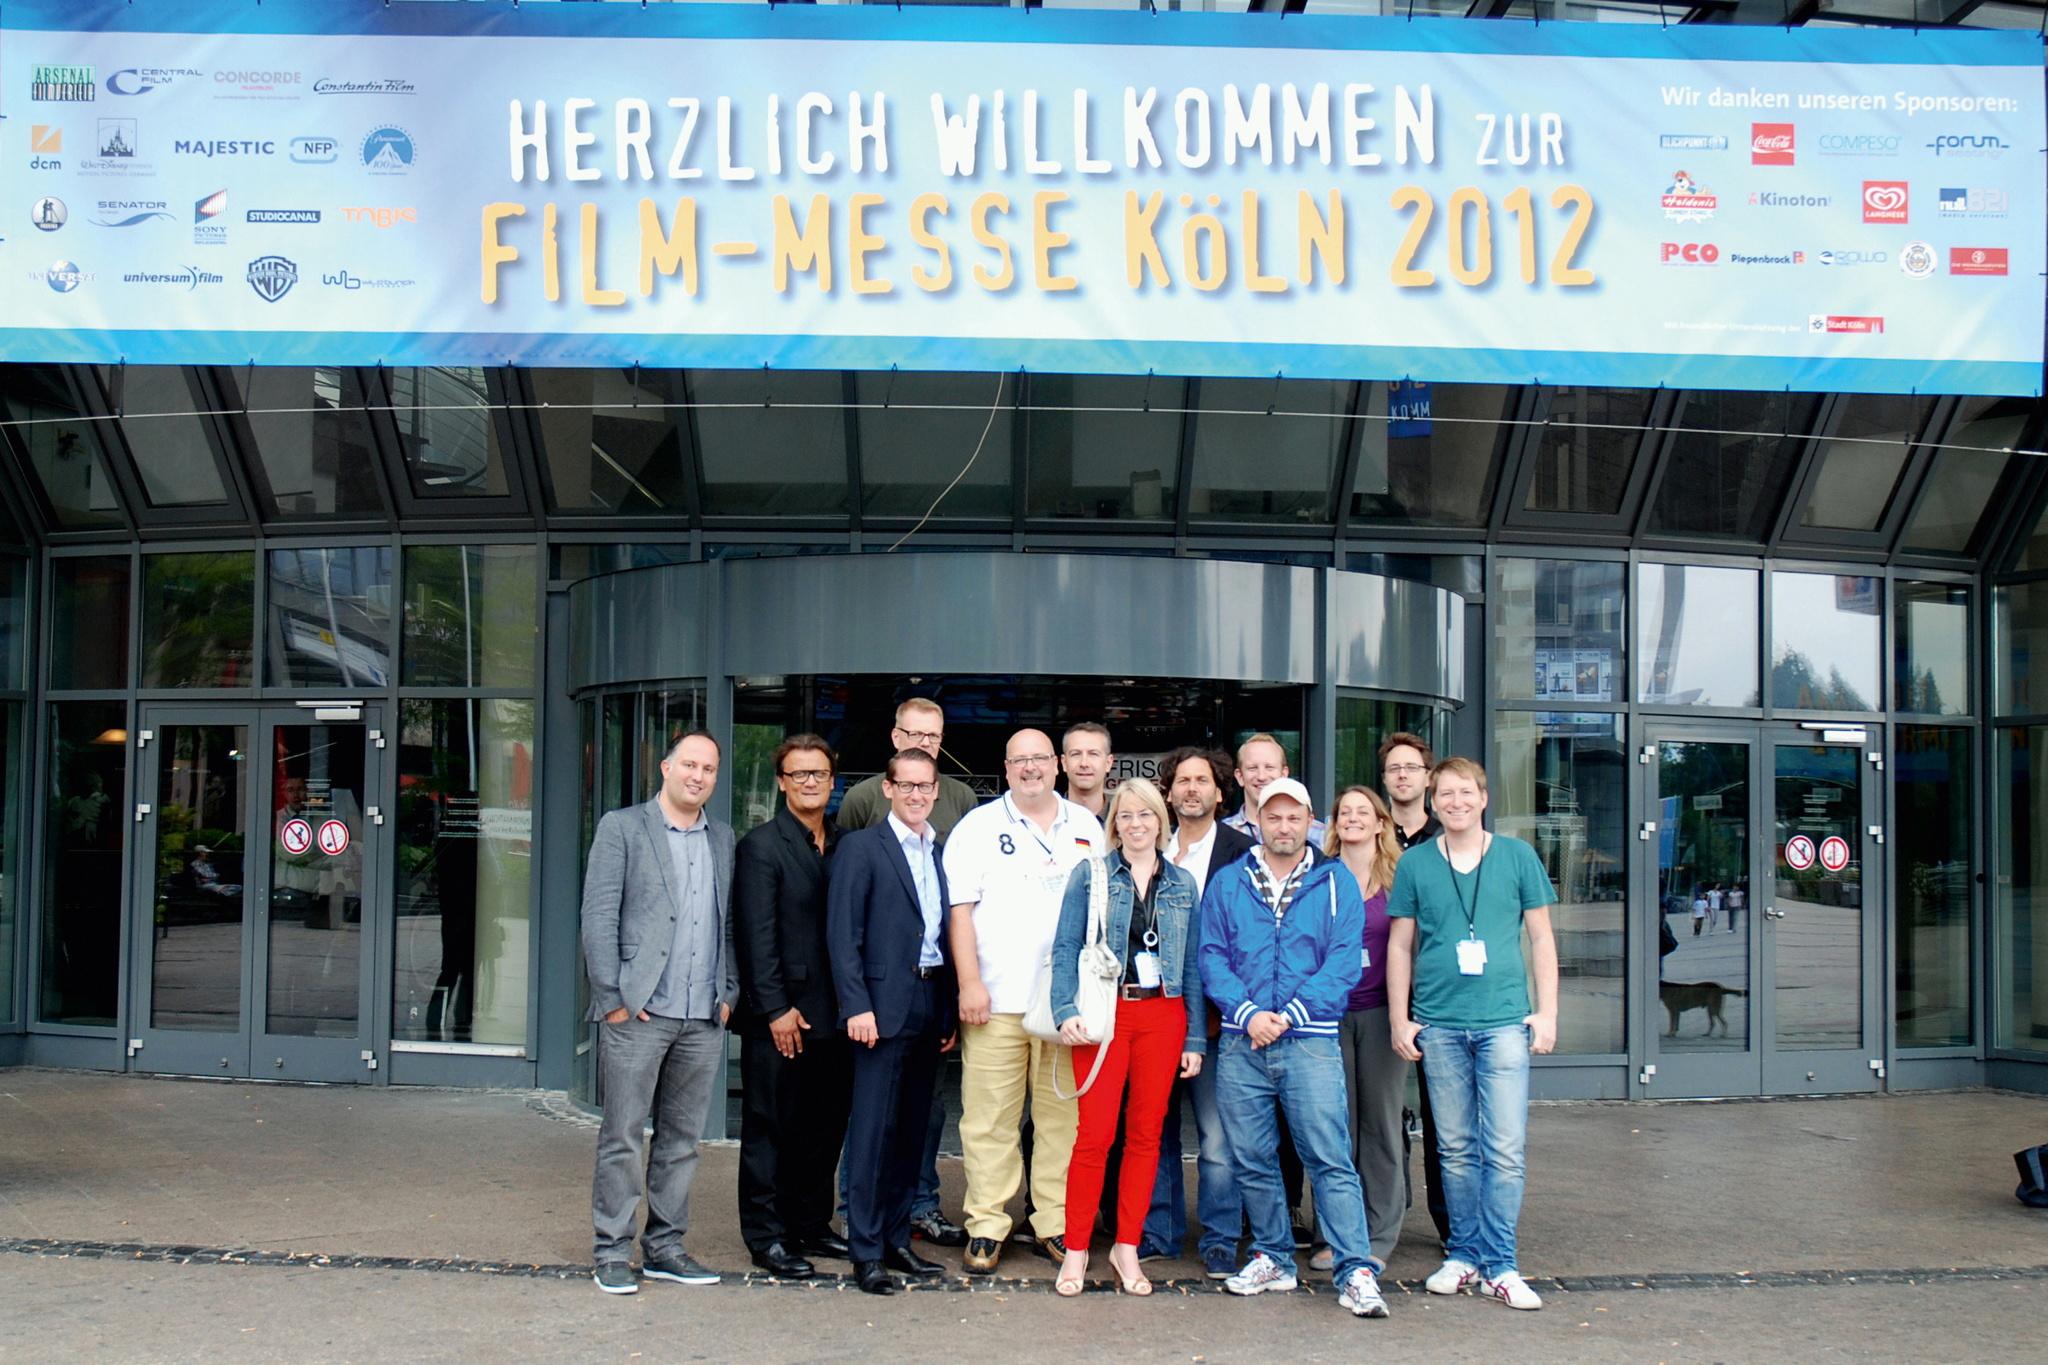 Cinedom Programm Köln